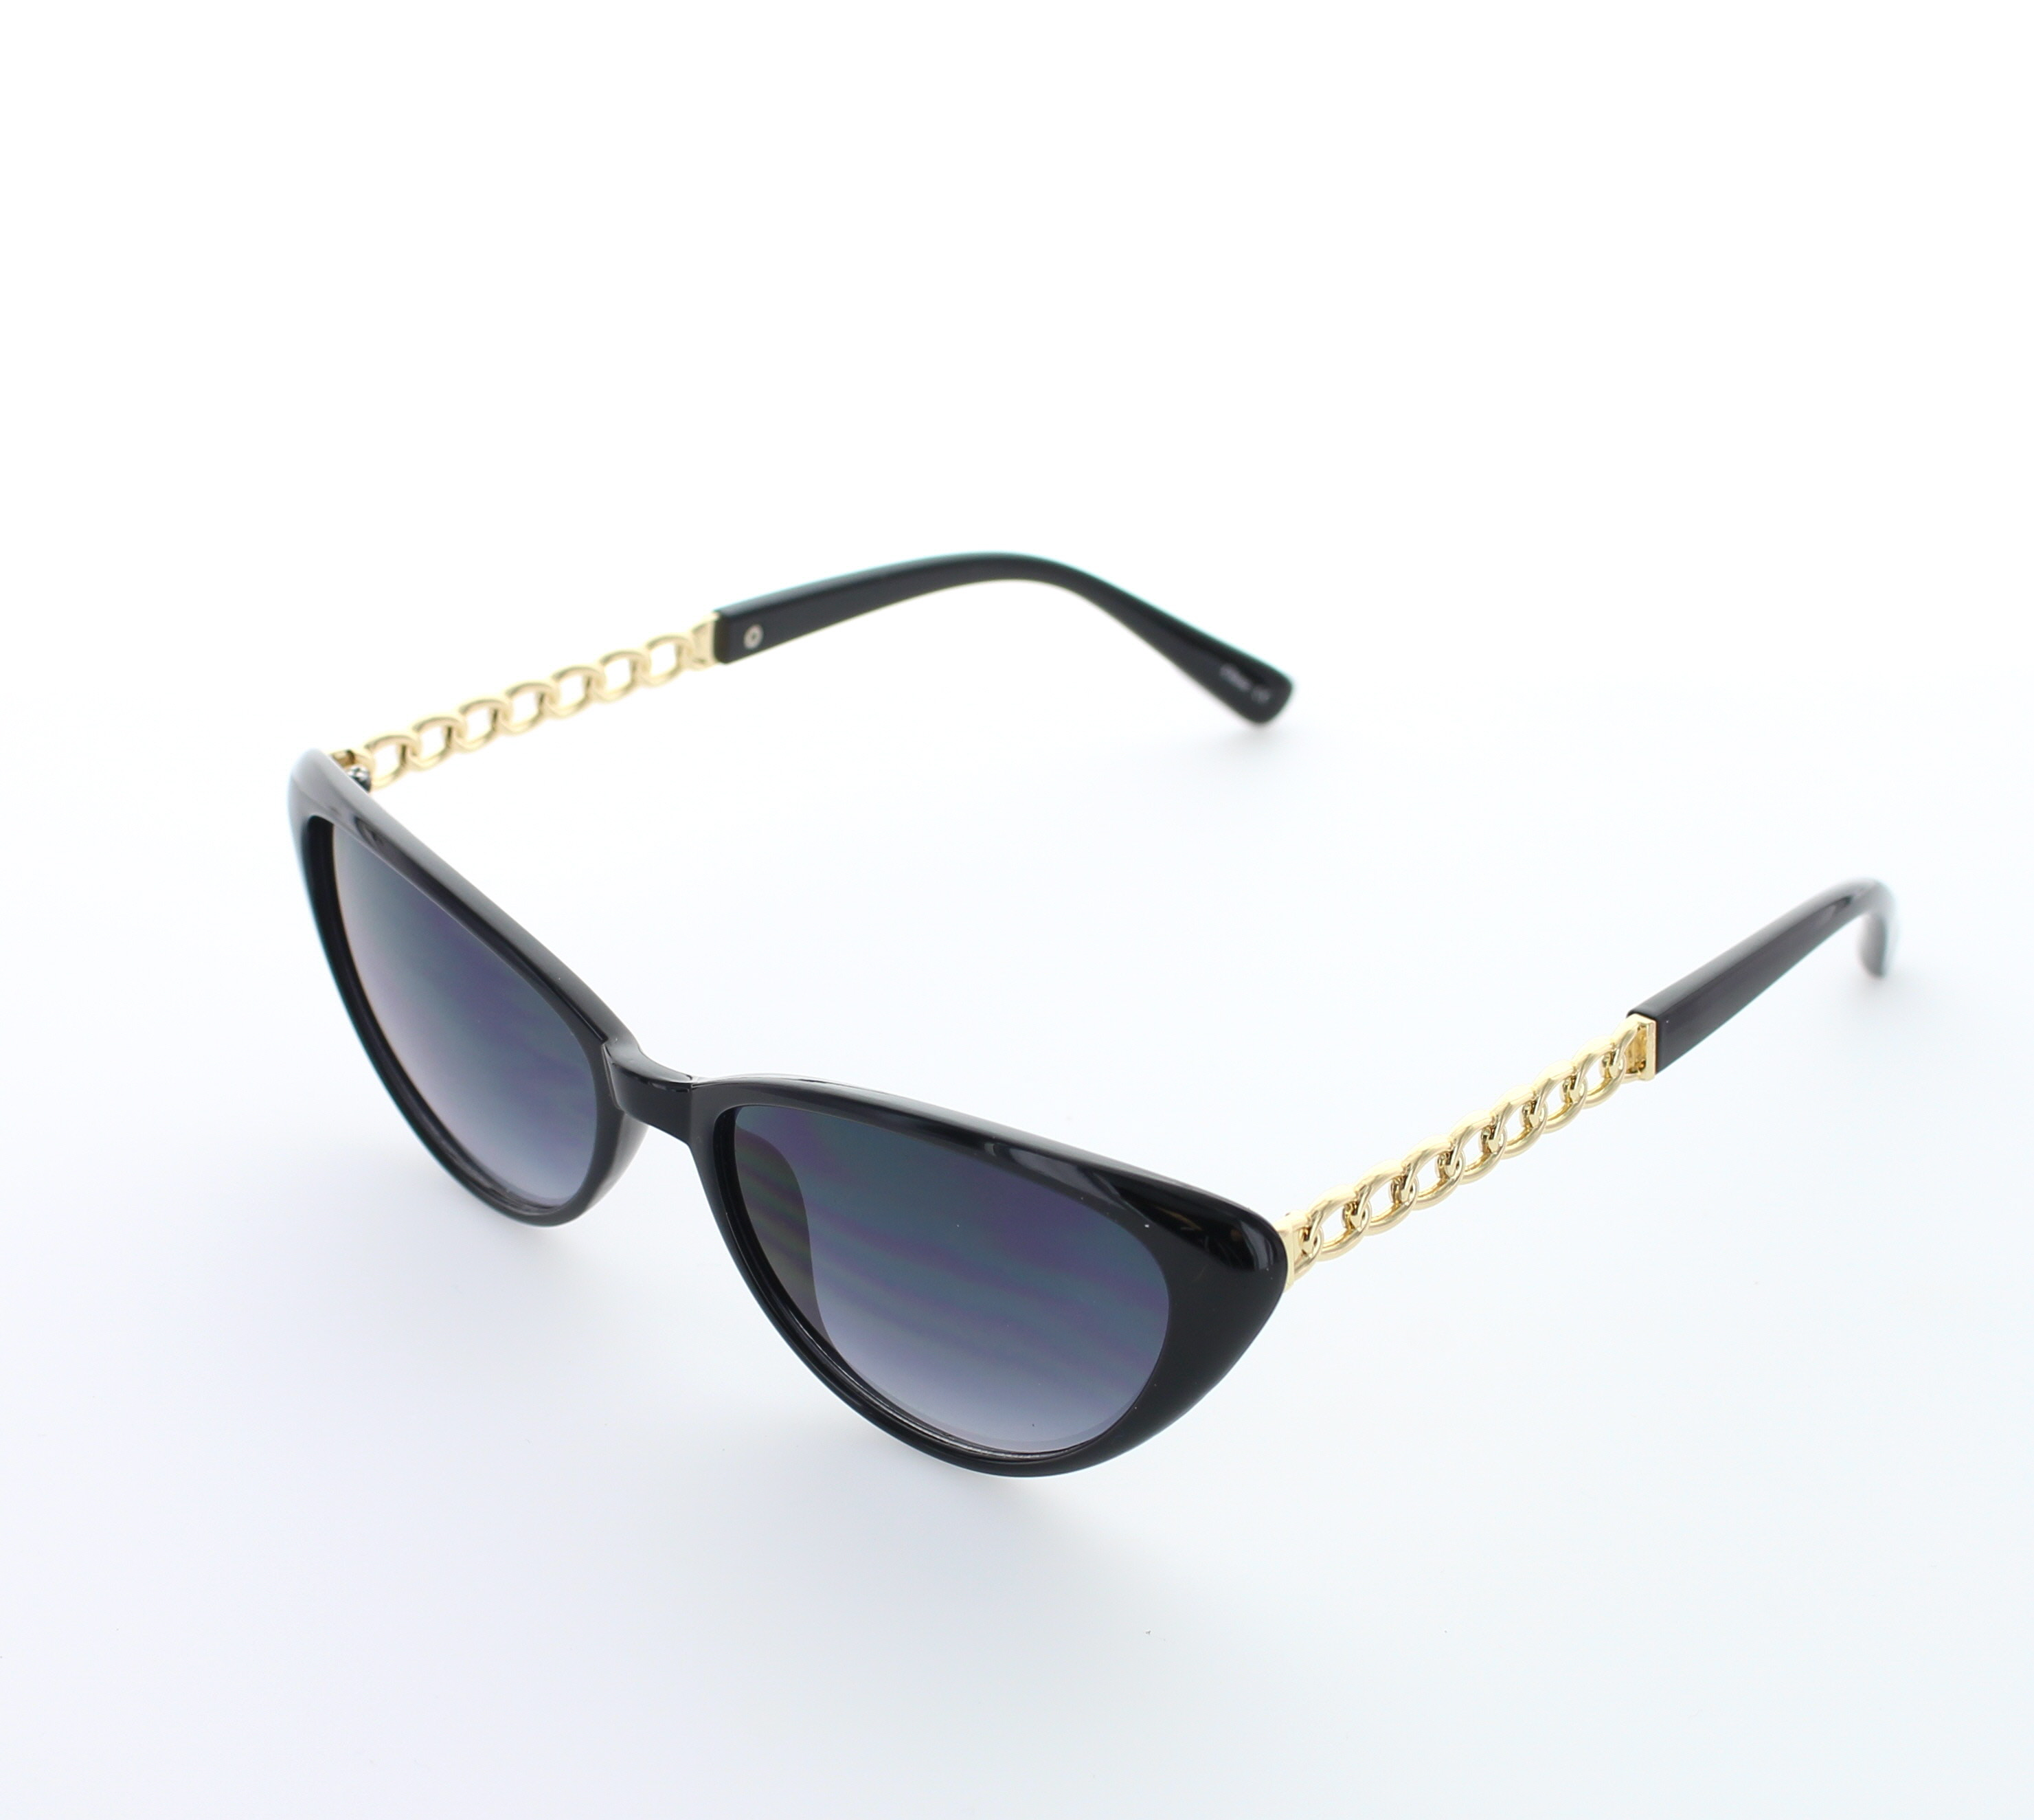 b8228b37fd1 Vogue Sunglasses Online Shopping